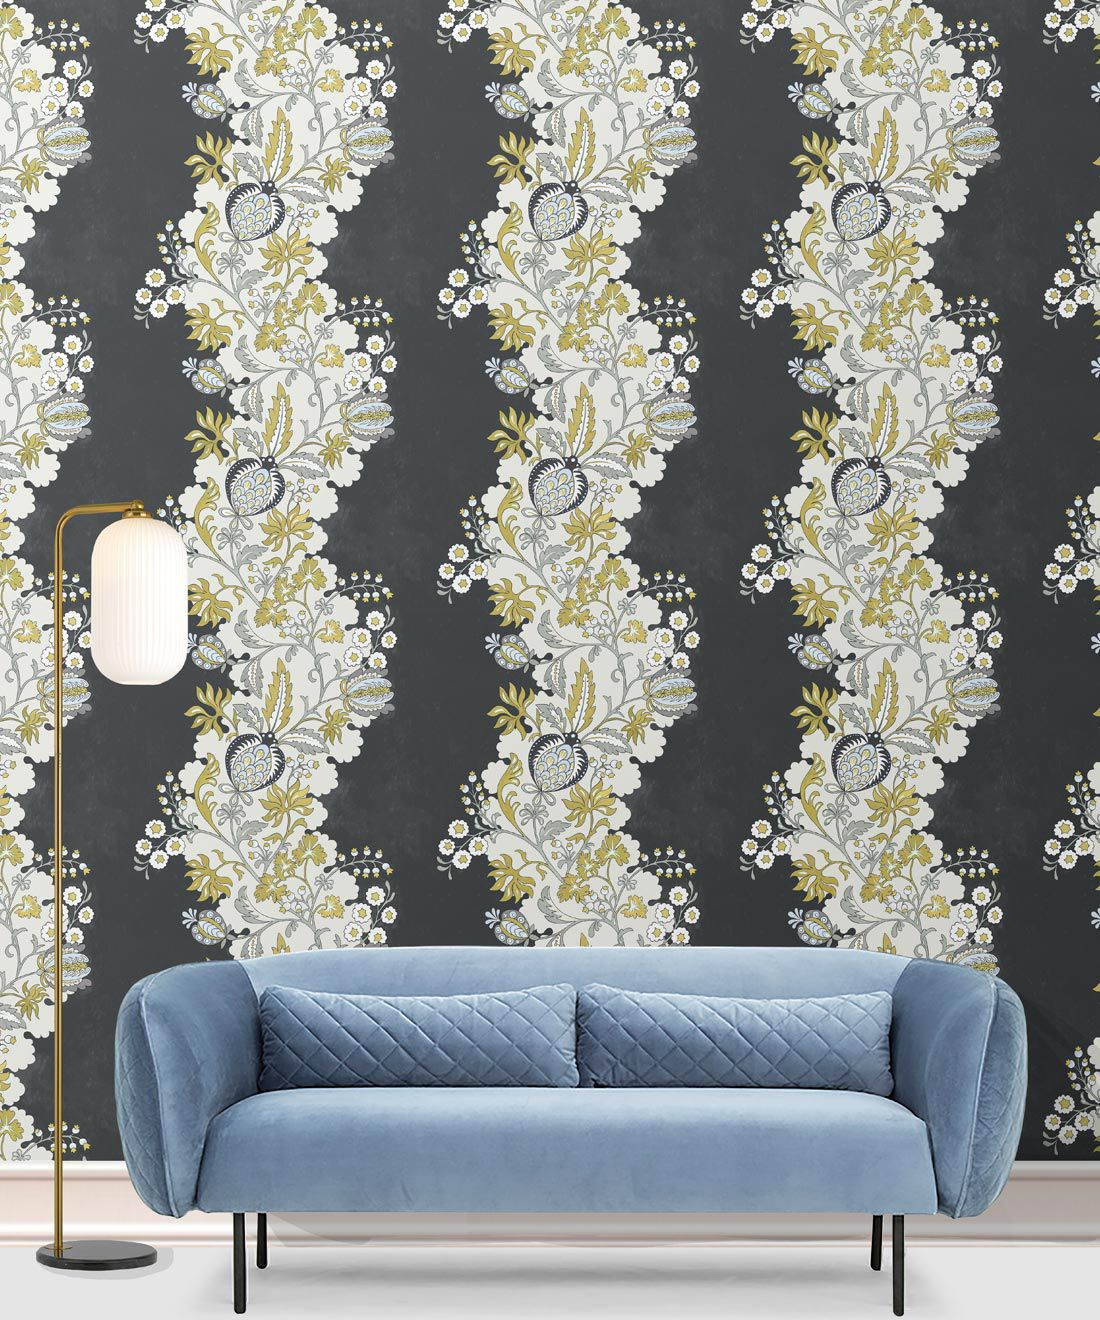 Pomegranate Wallpaper • Charcoal • Insitu with blue sofa